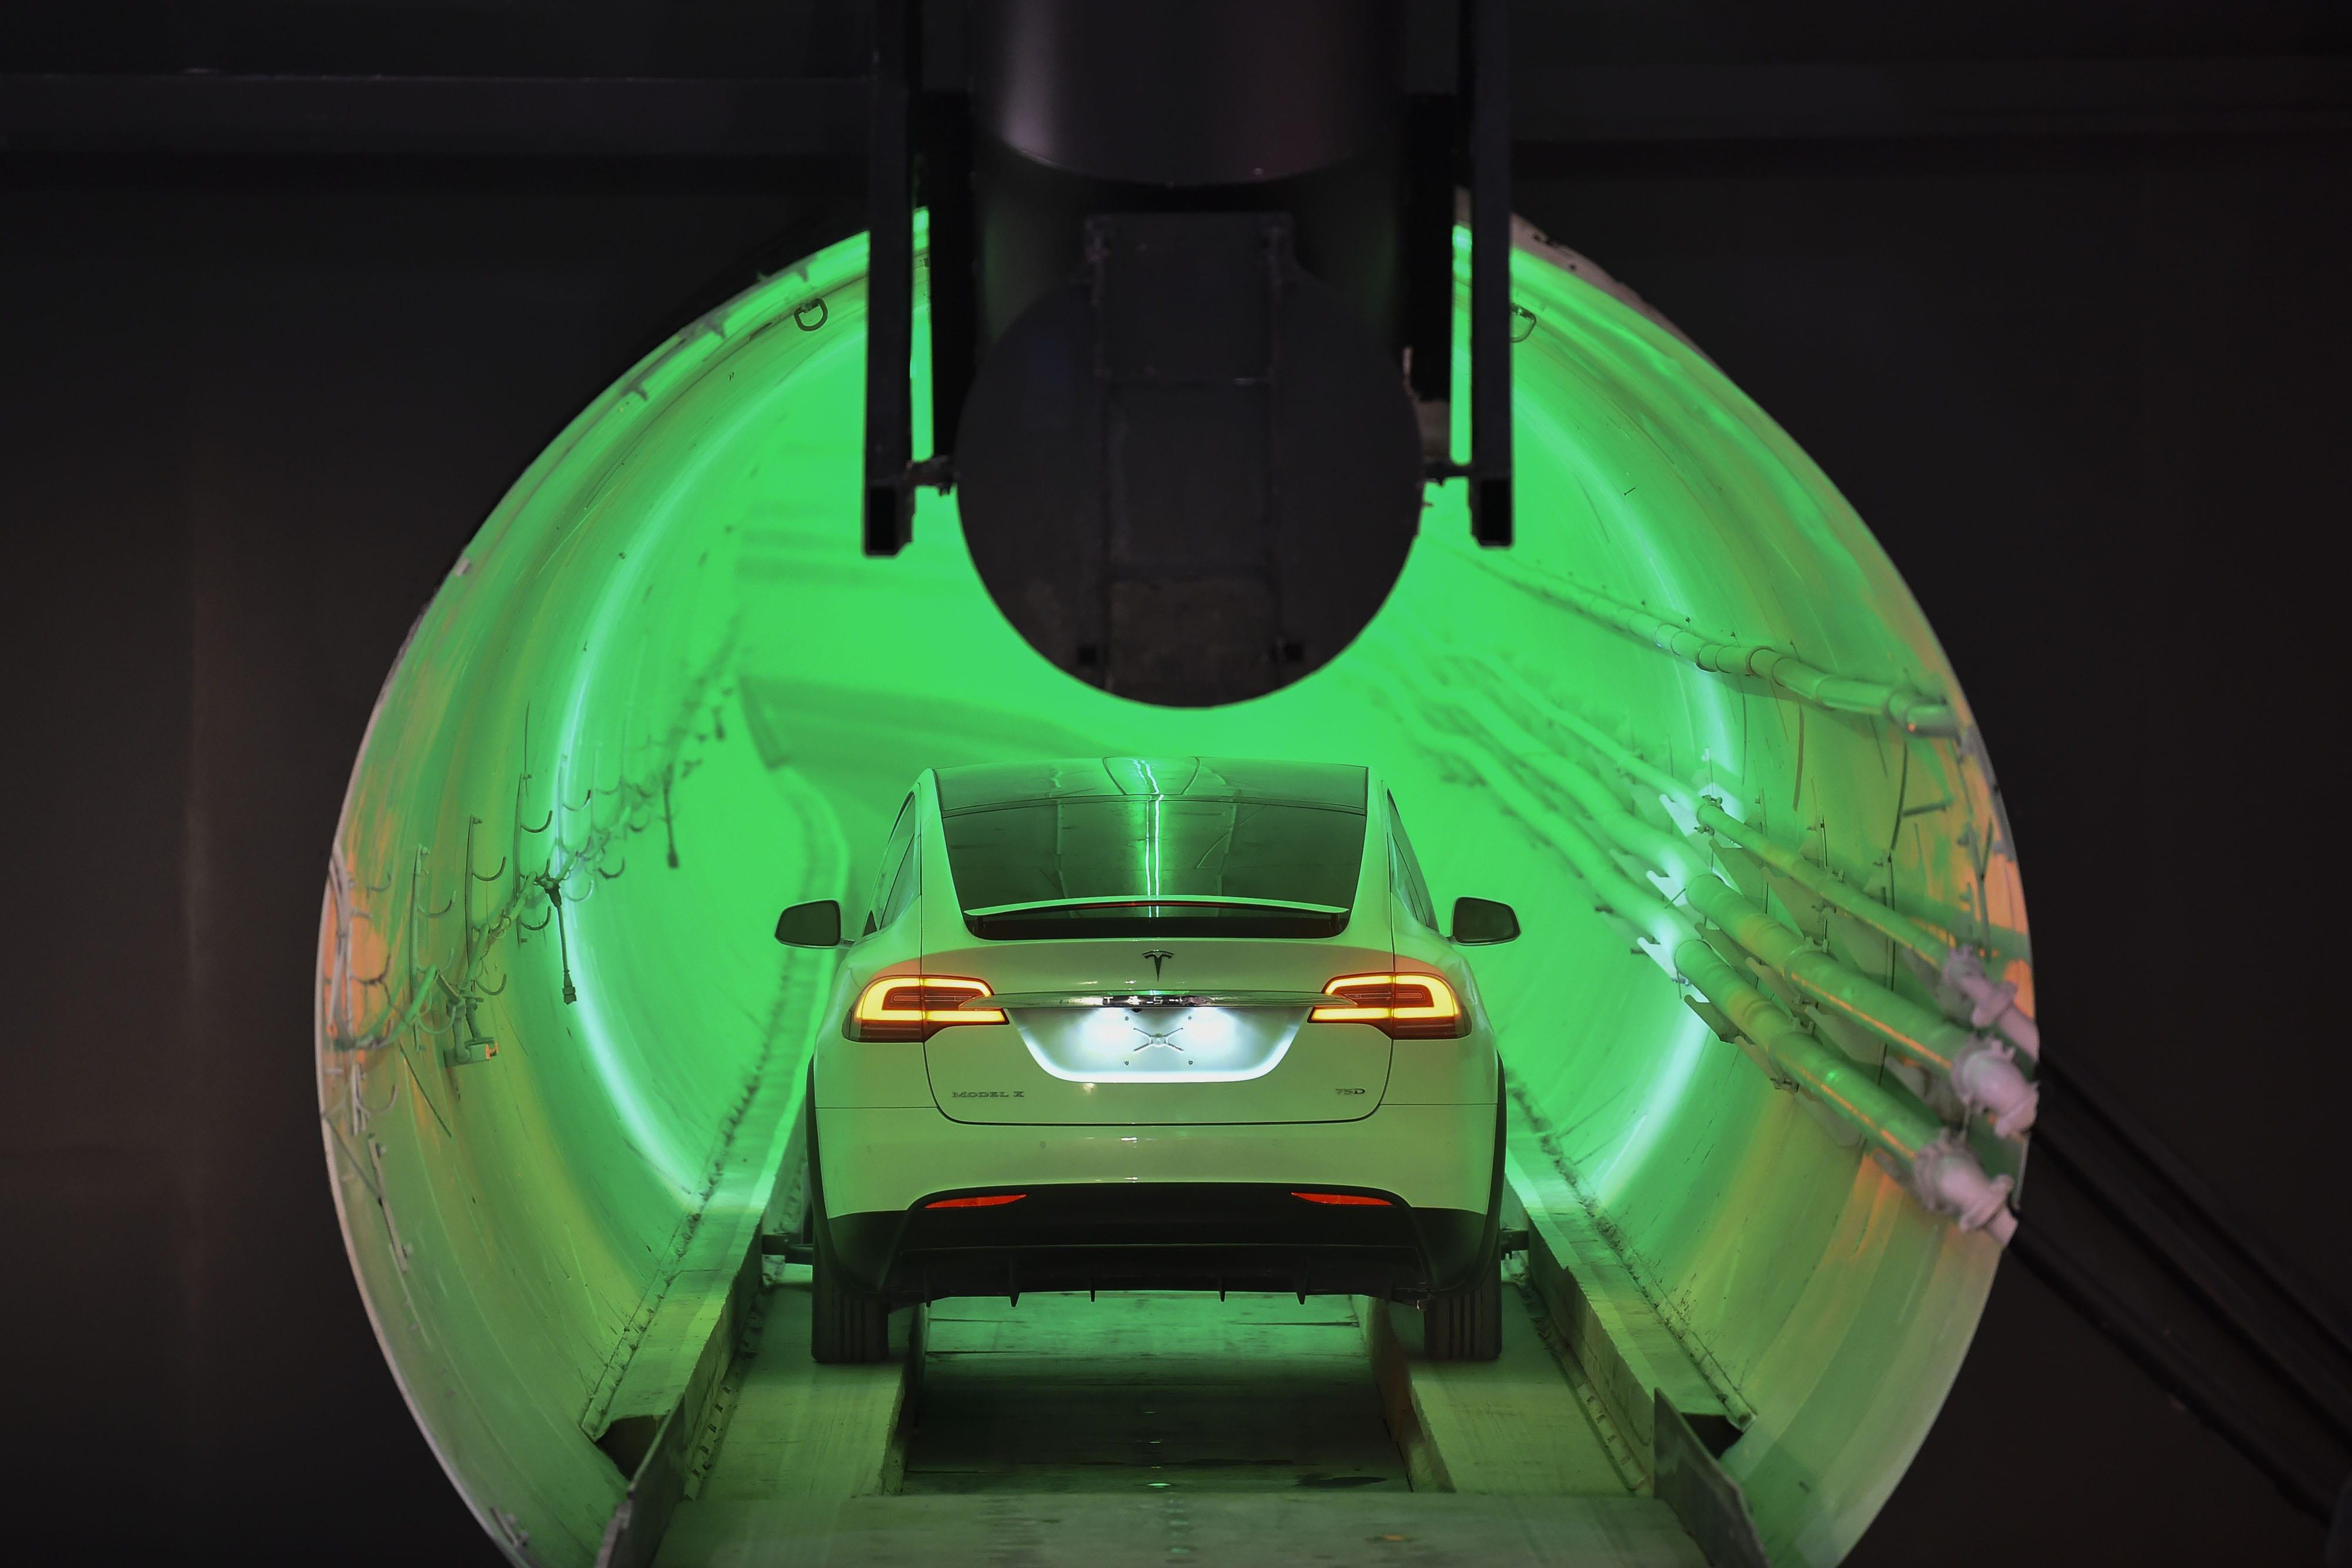 Elon Musk's Boring Company Is Not Groundbreaking Tech, Says Tunnel Expert